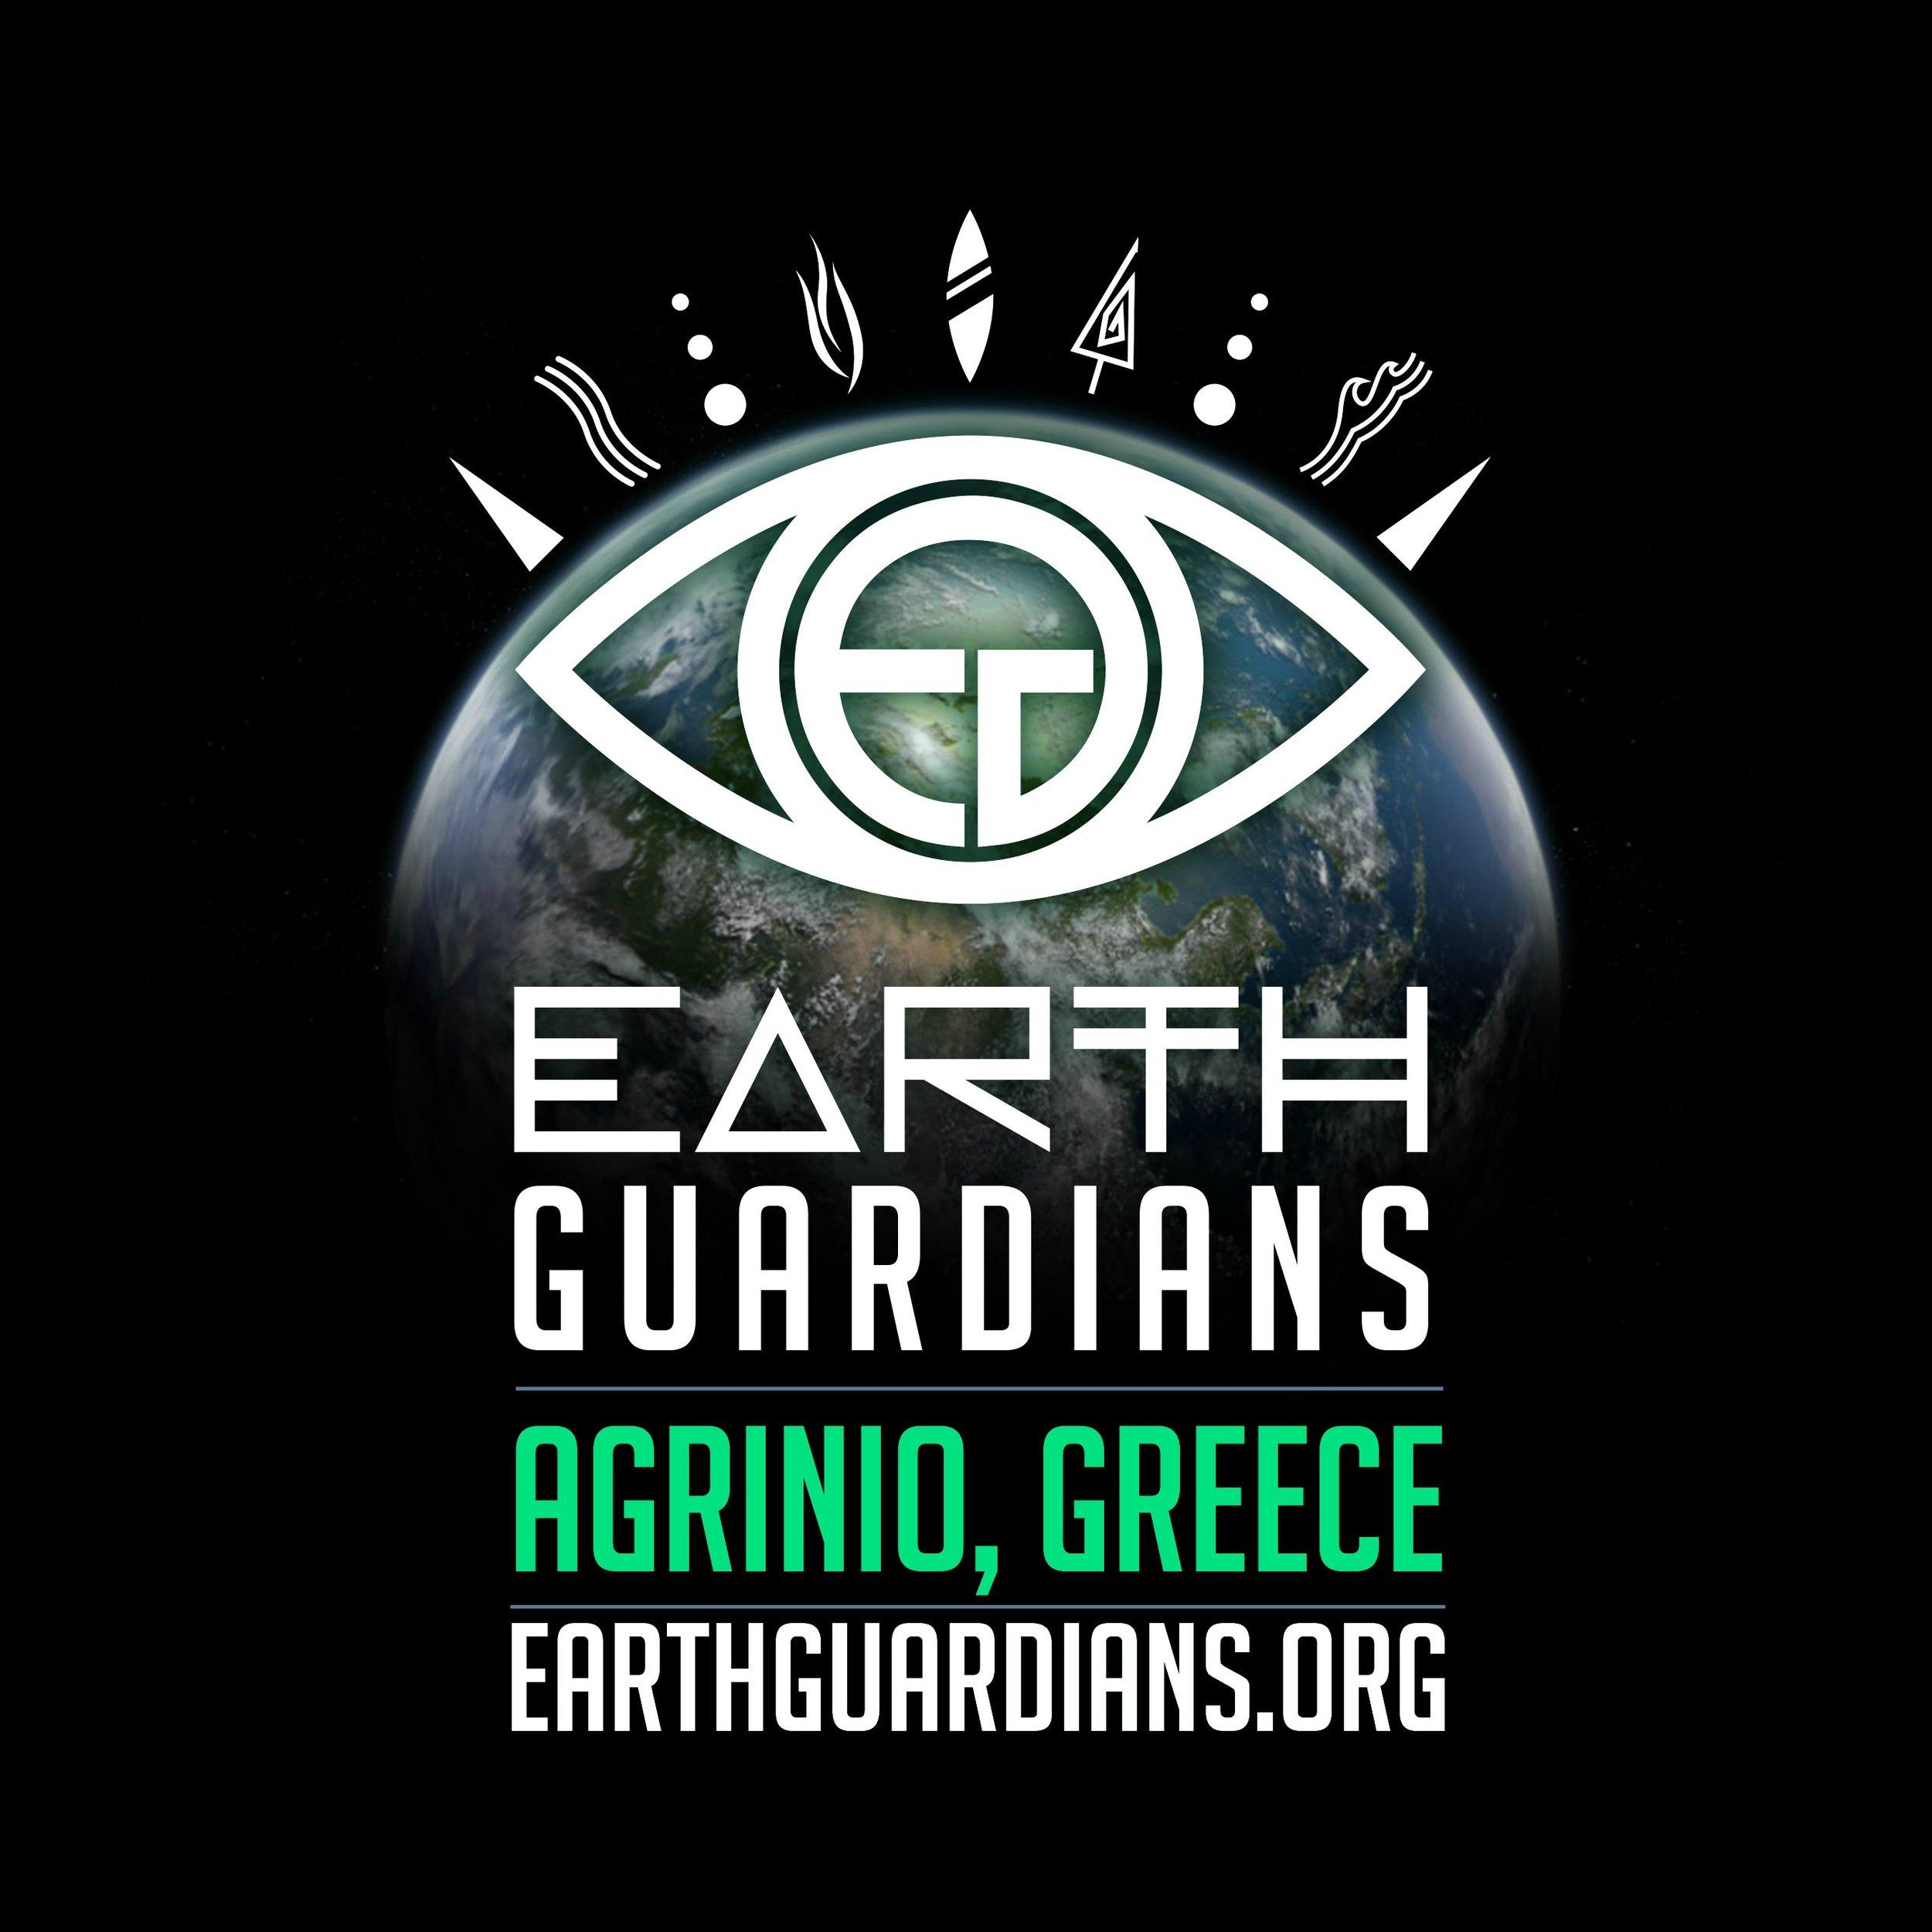 EG_crew logo AGRINIO GREECE.jpg